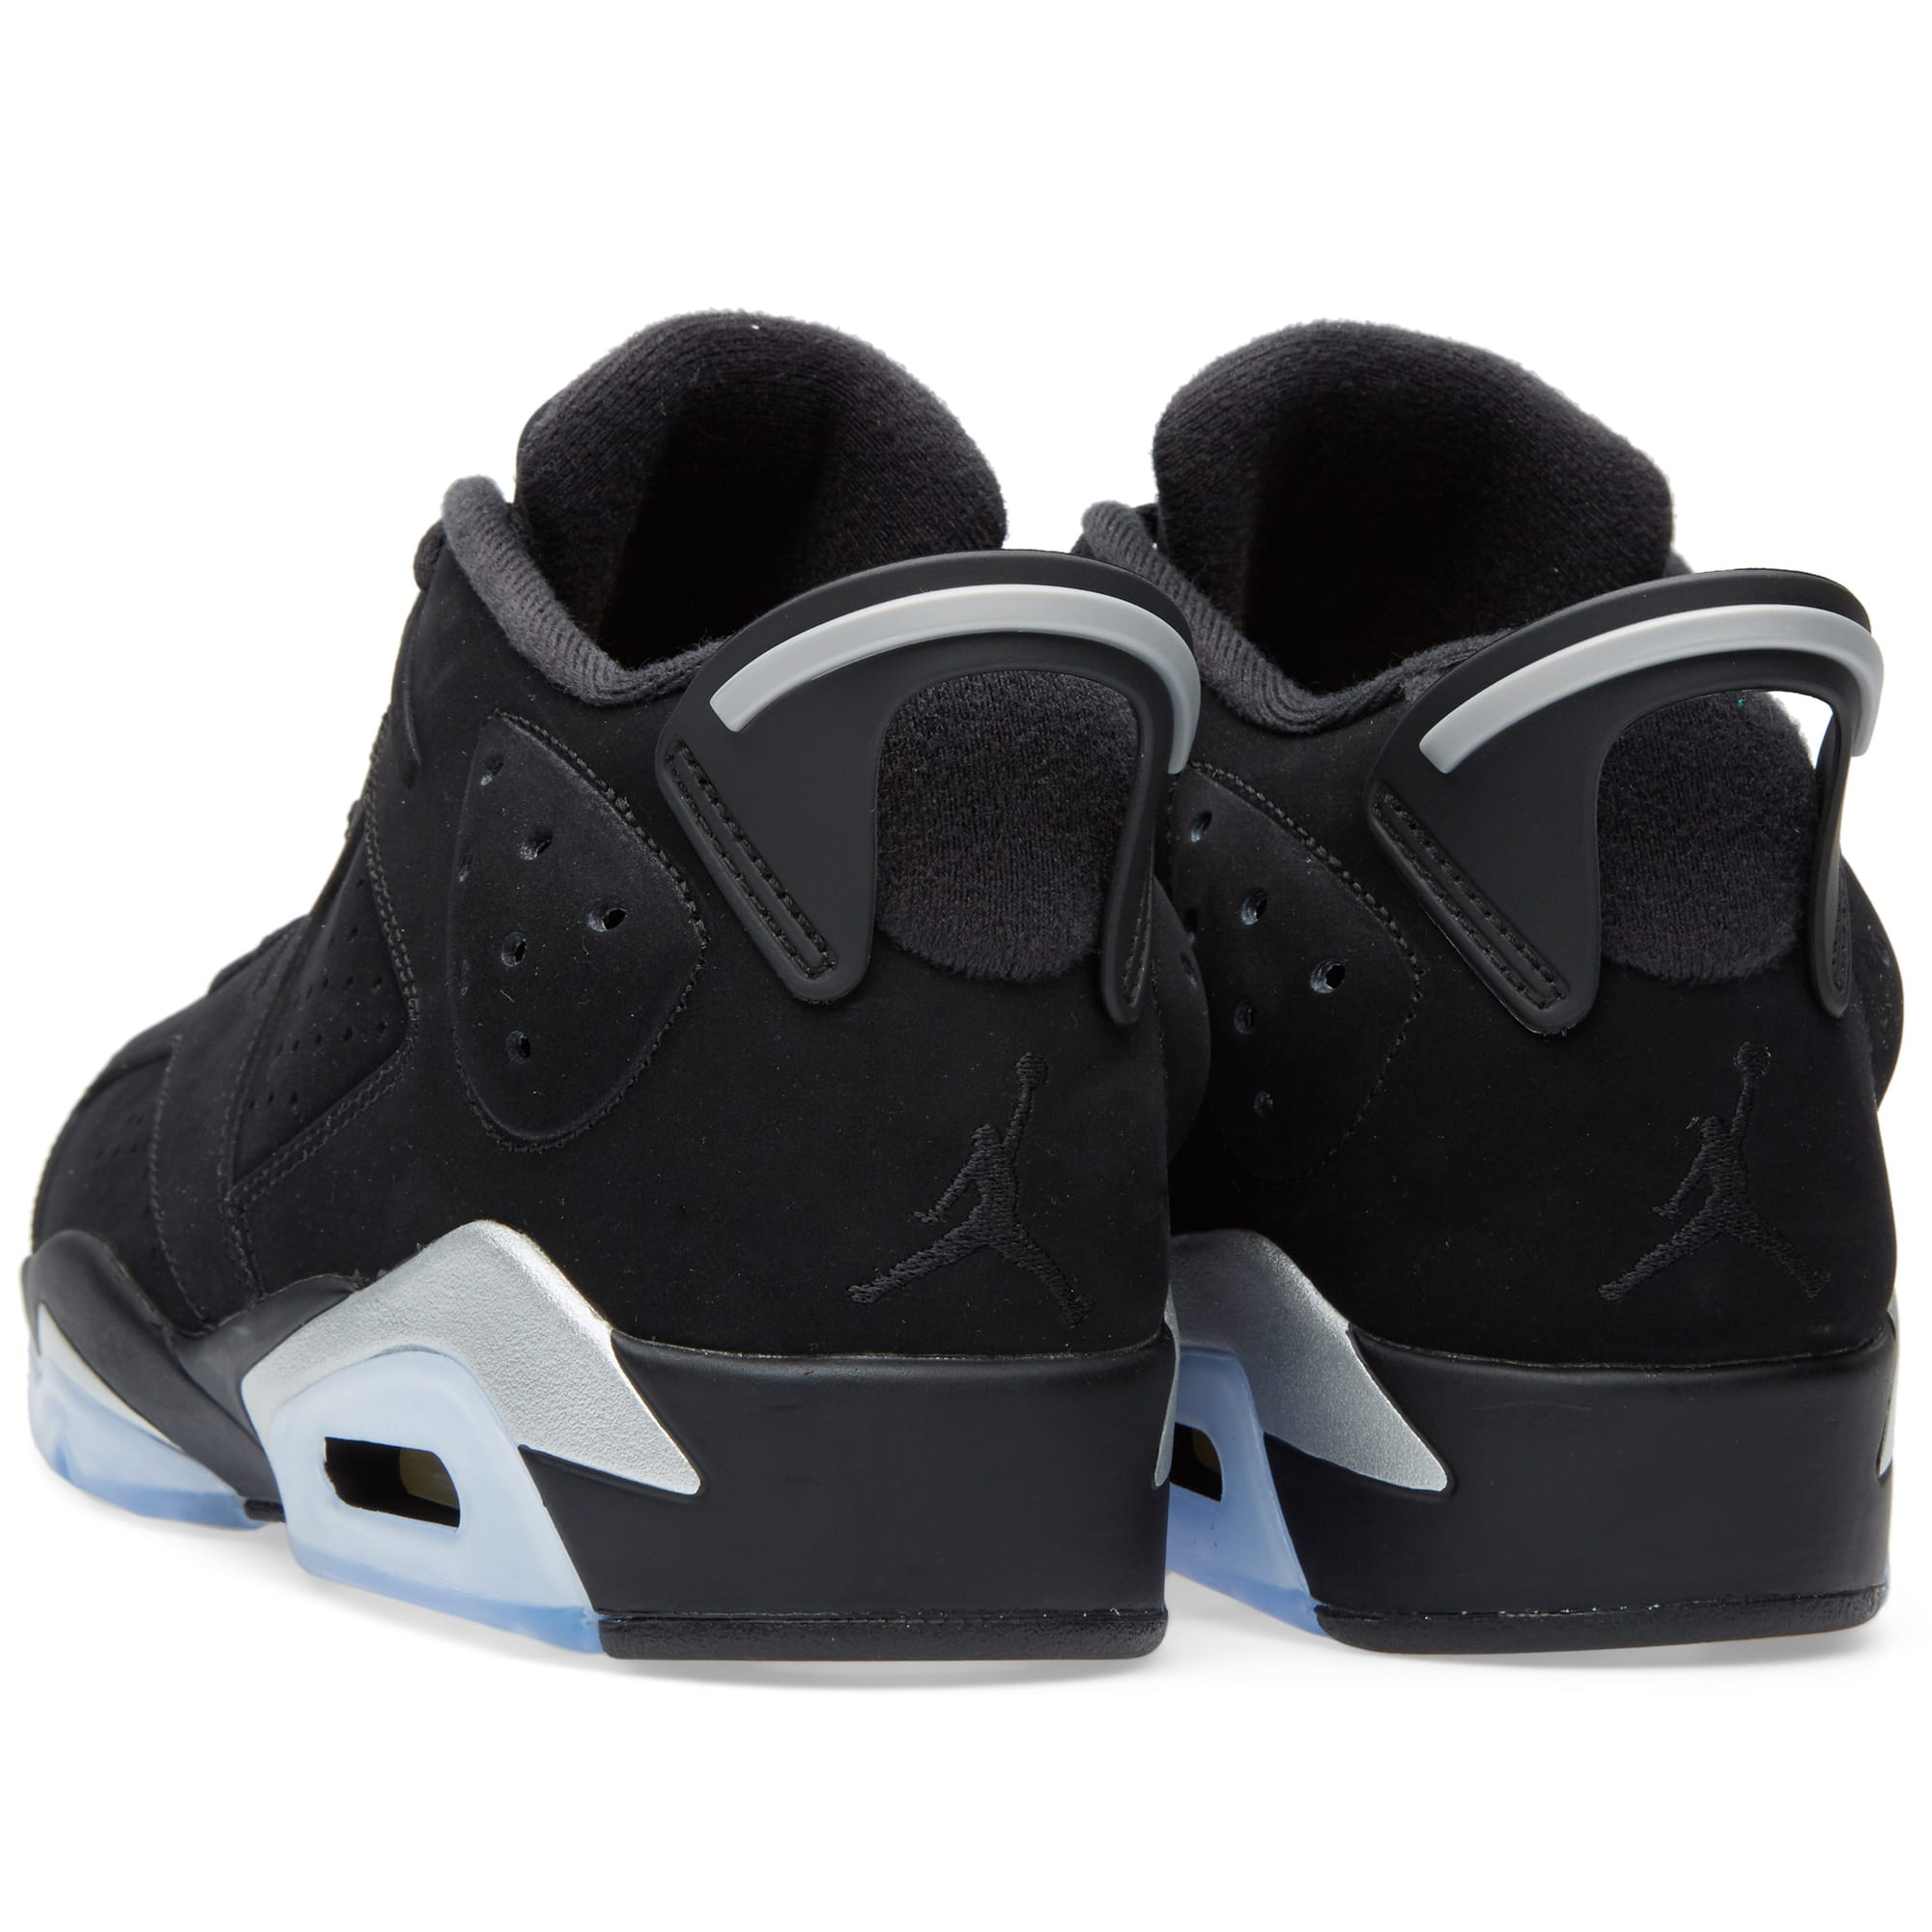 103e174dd72cc3 Nike Air Jordan 6 Retro Low Black